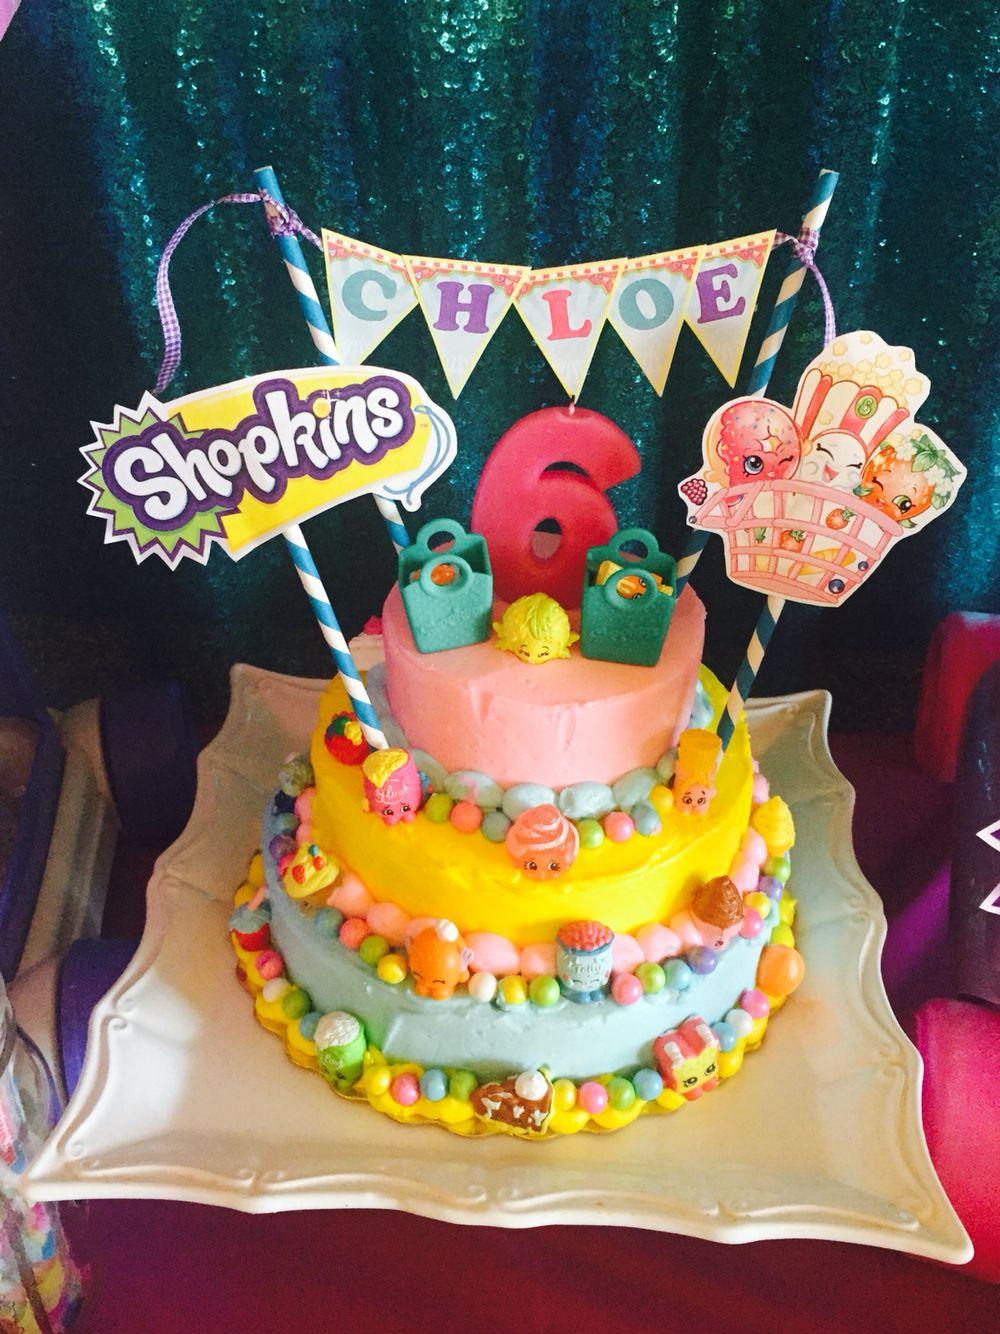 Diy Shopkins Cake With Images Shopkins Birthday Cake